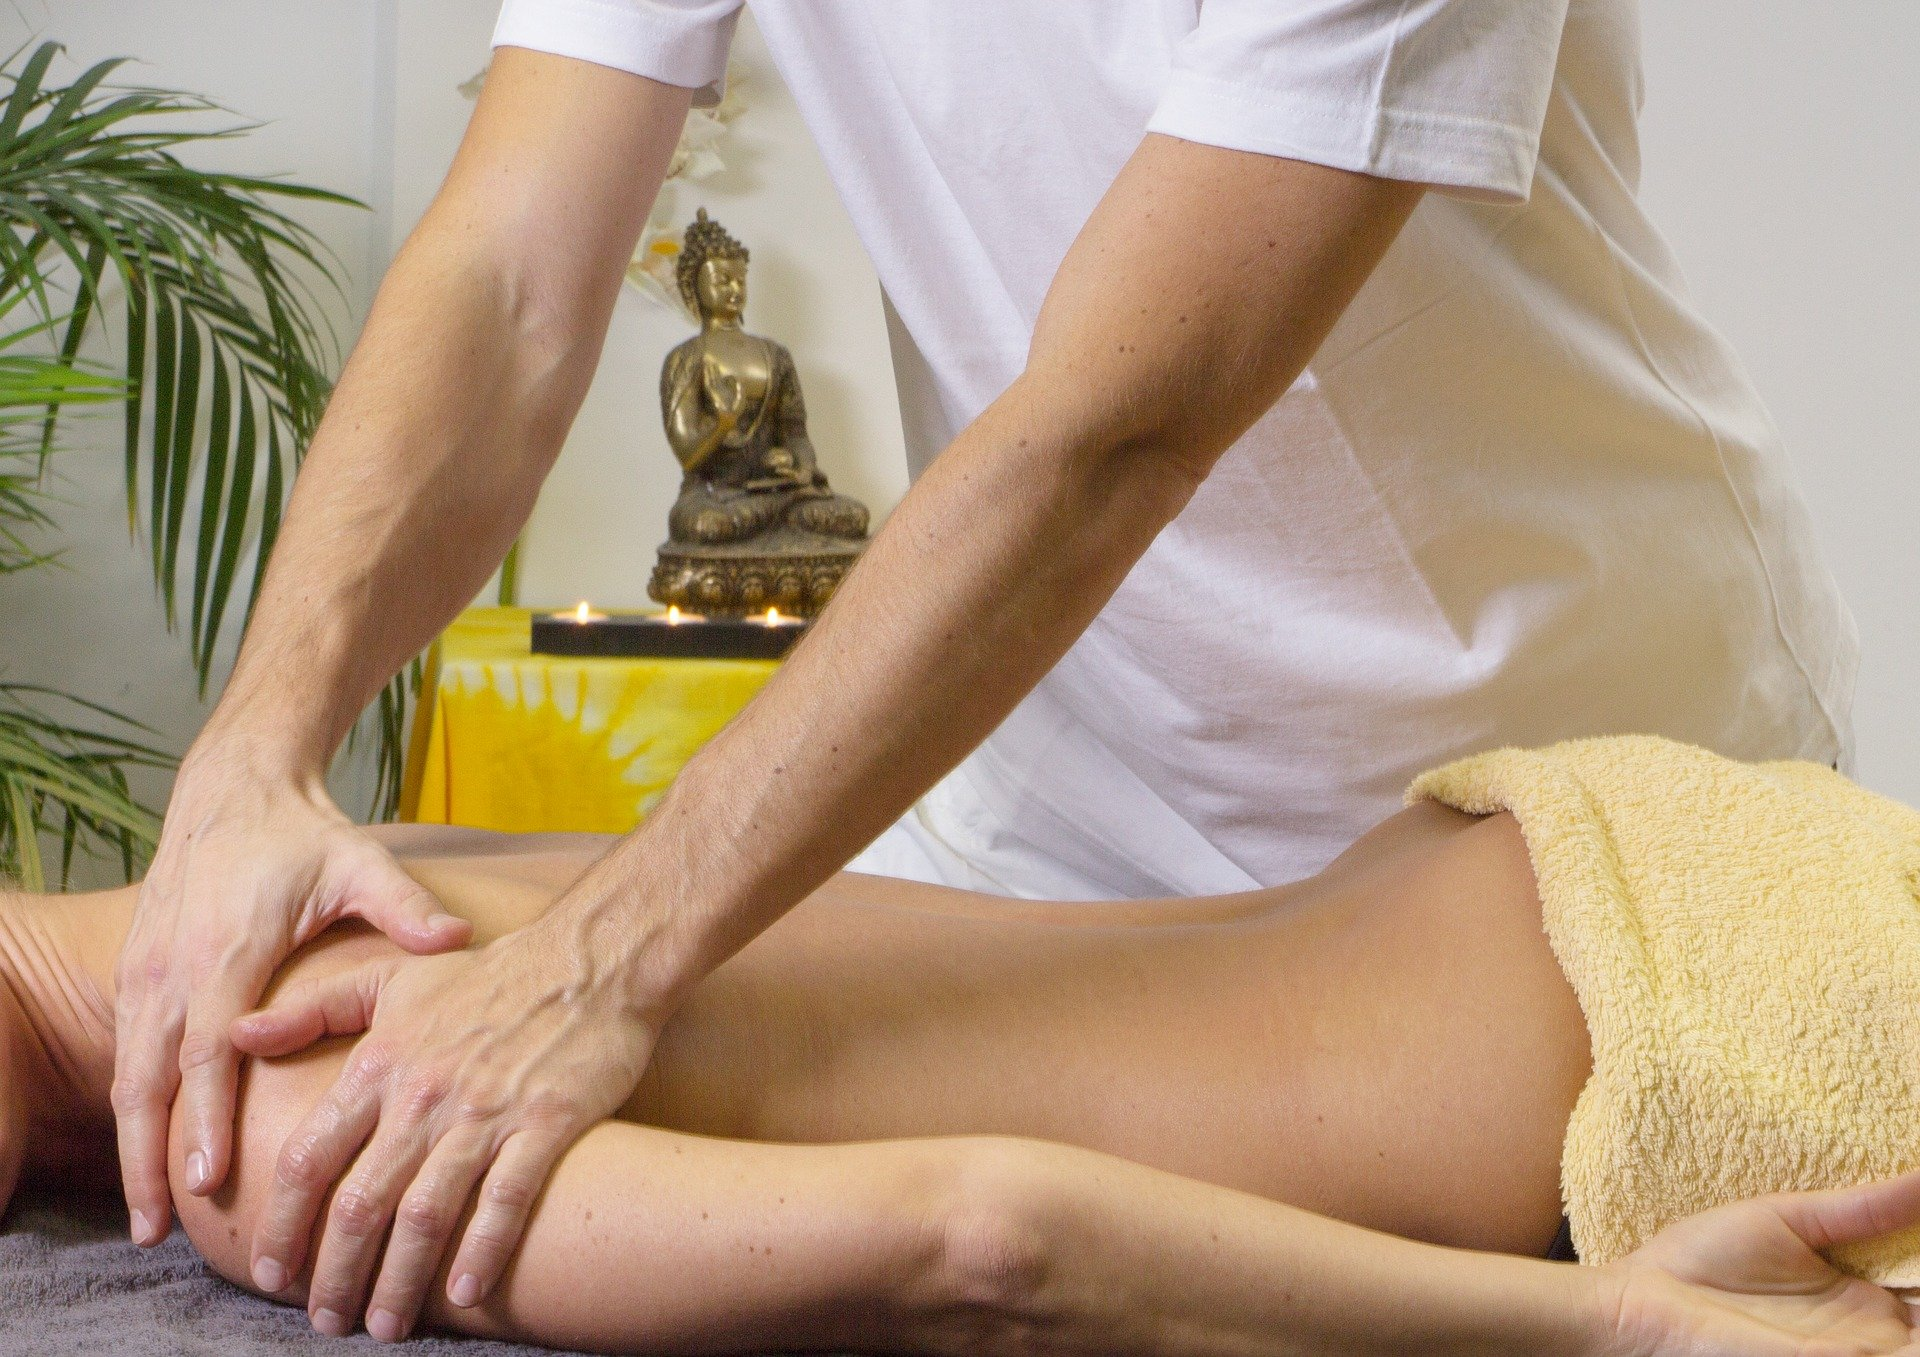 prevent neck pain from sleeping. back massage. sleep. relax. www.blisslife.in